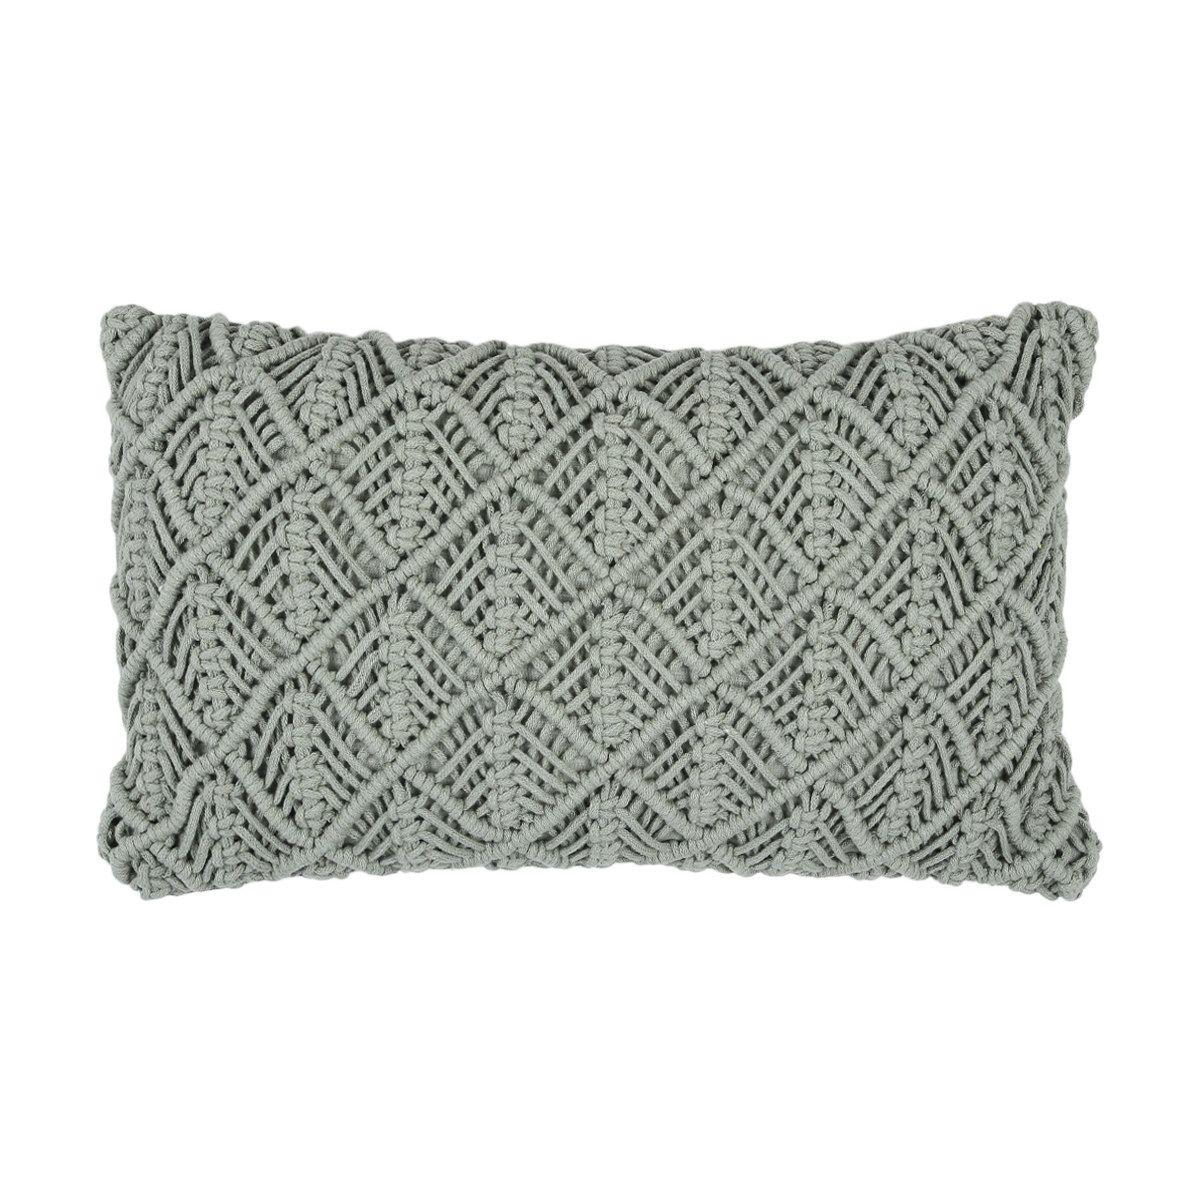 Willow Cushion Green Kmart Boho cushions, Cushions